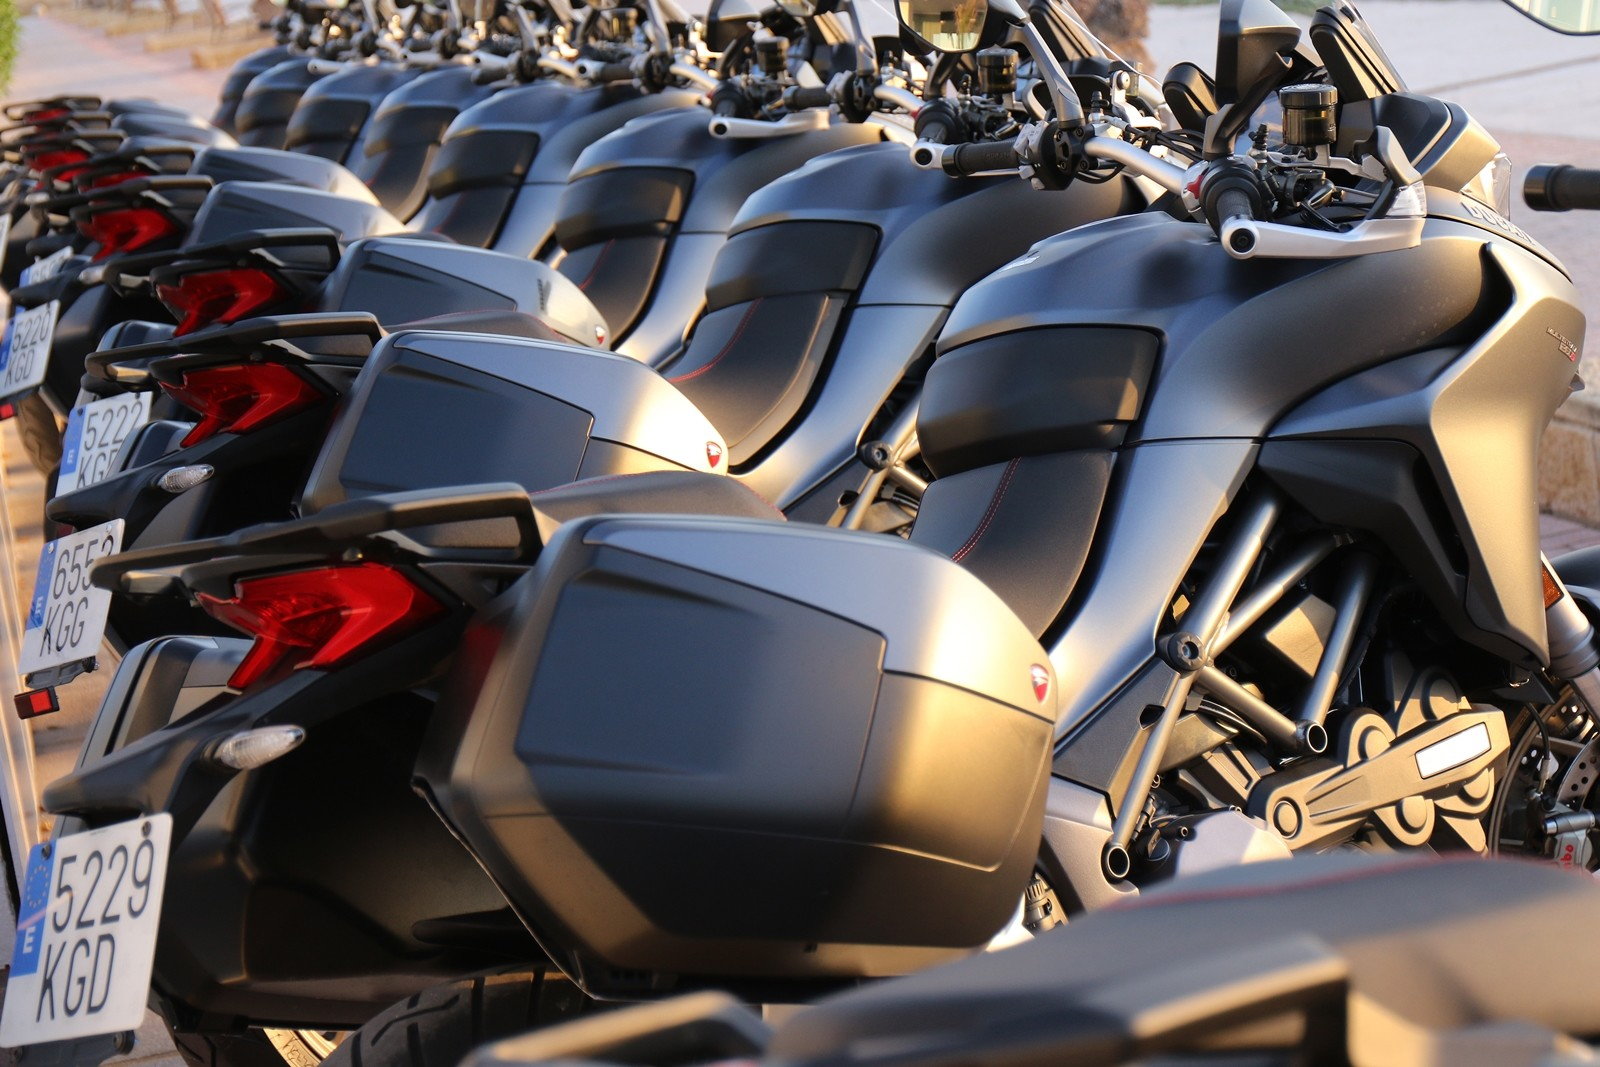 Foto de Ducati Multistrada 1260 2018 prueba (13/21)